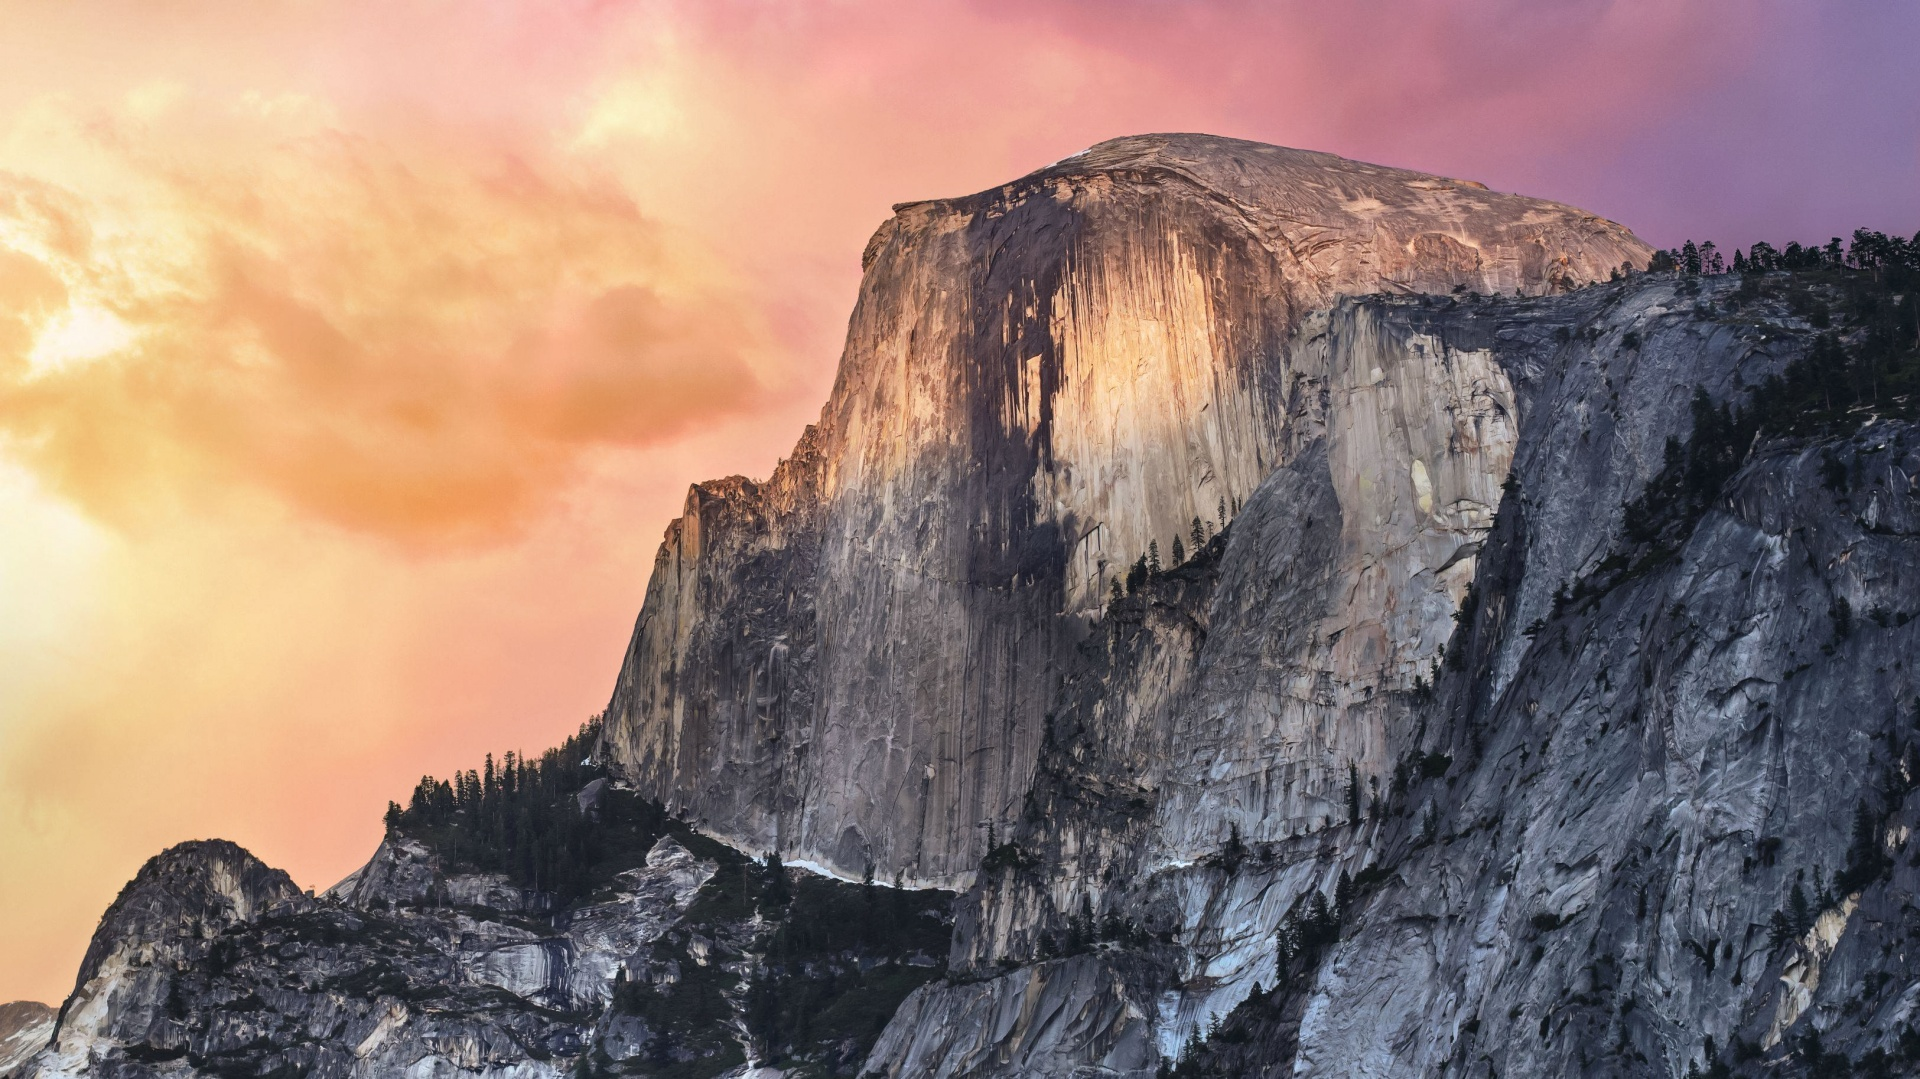 1920x1080 OS X Yosemite desktop PC and Mac wallpaper 1920x1079